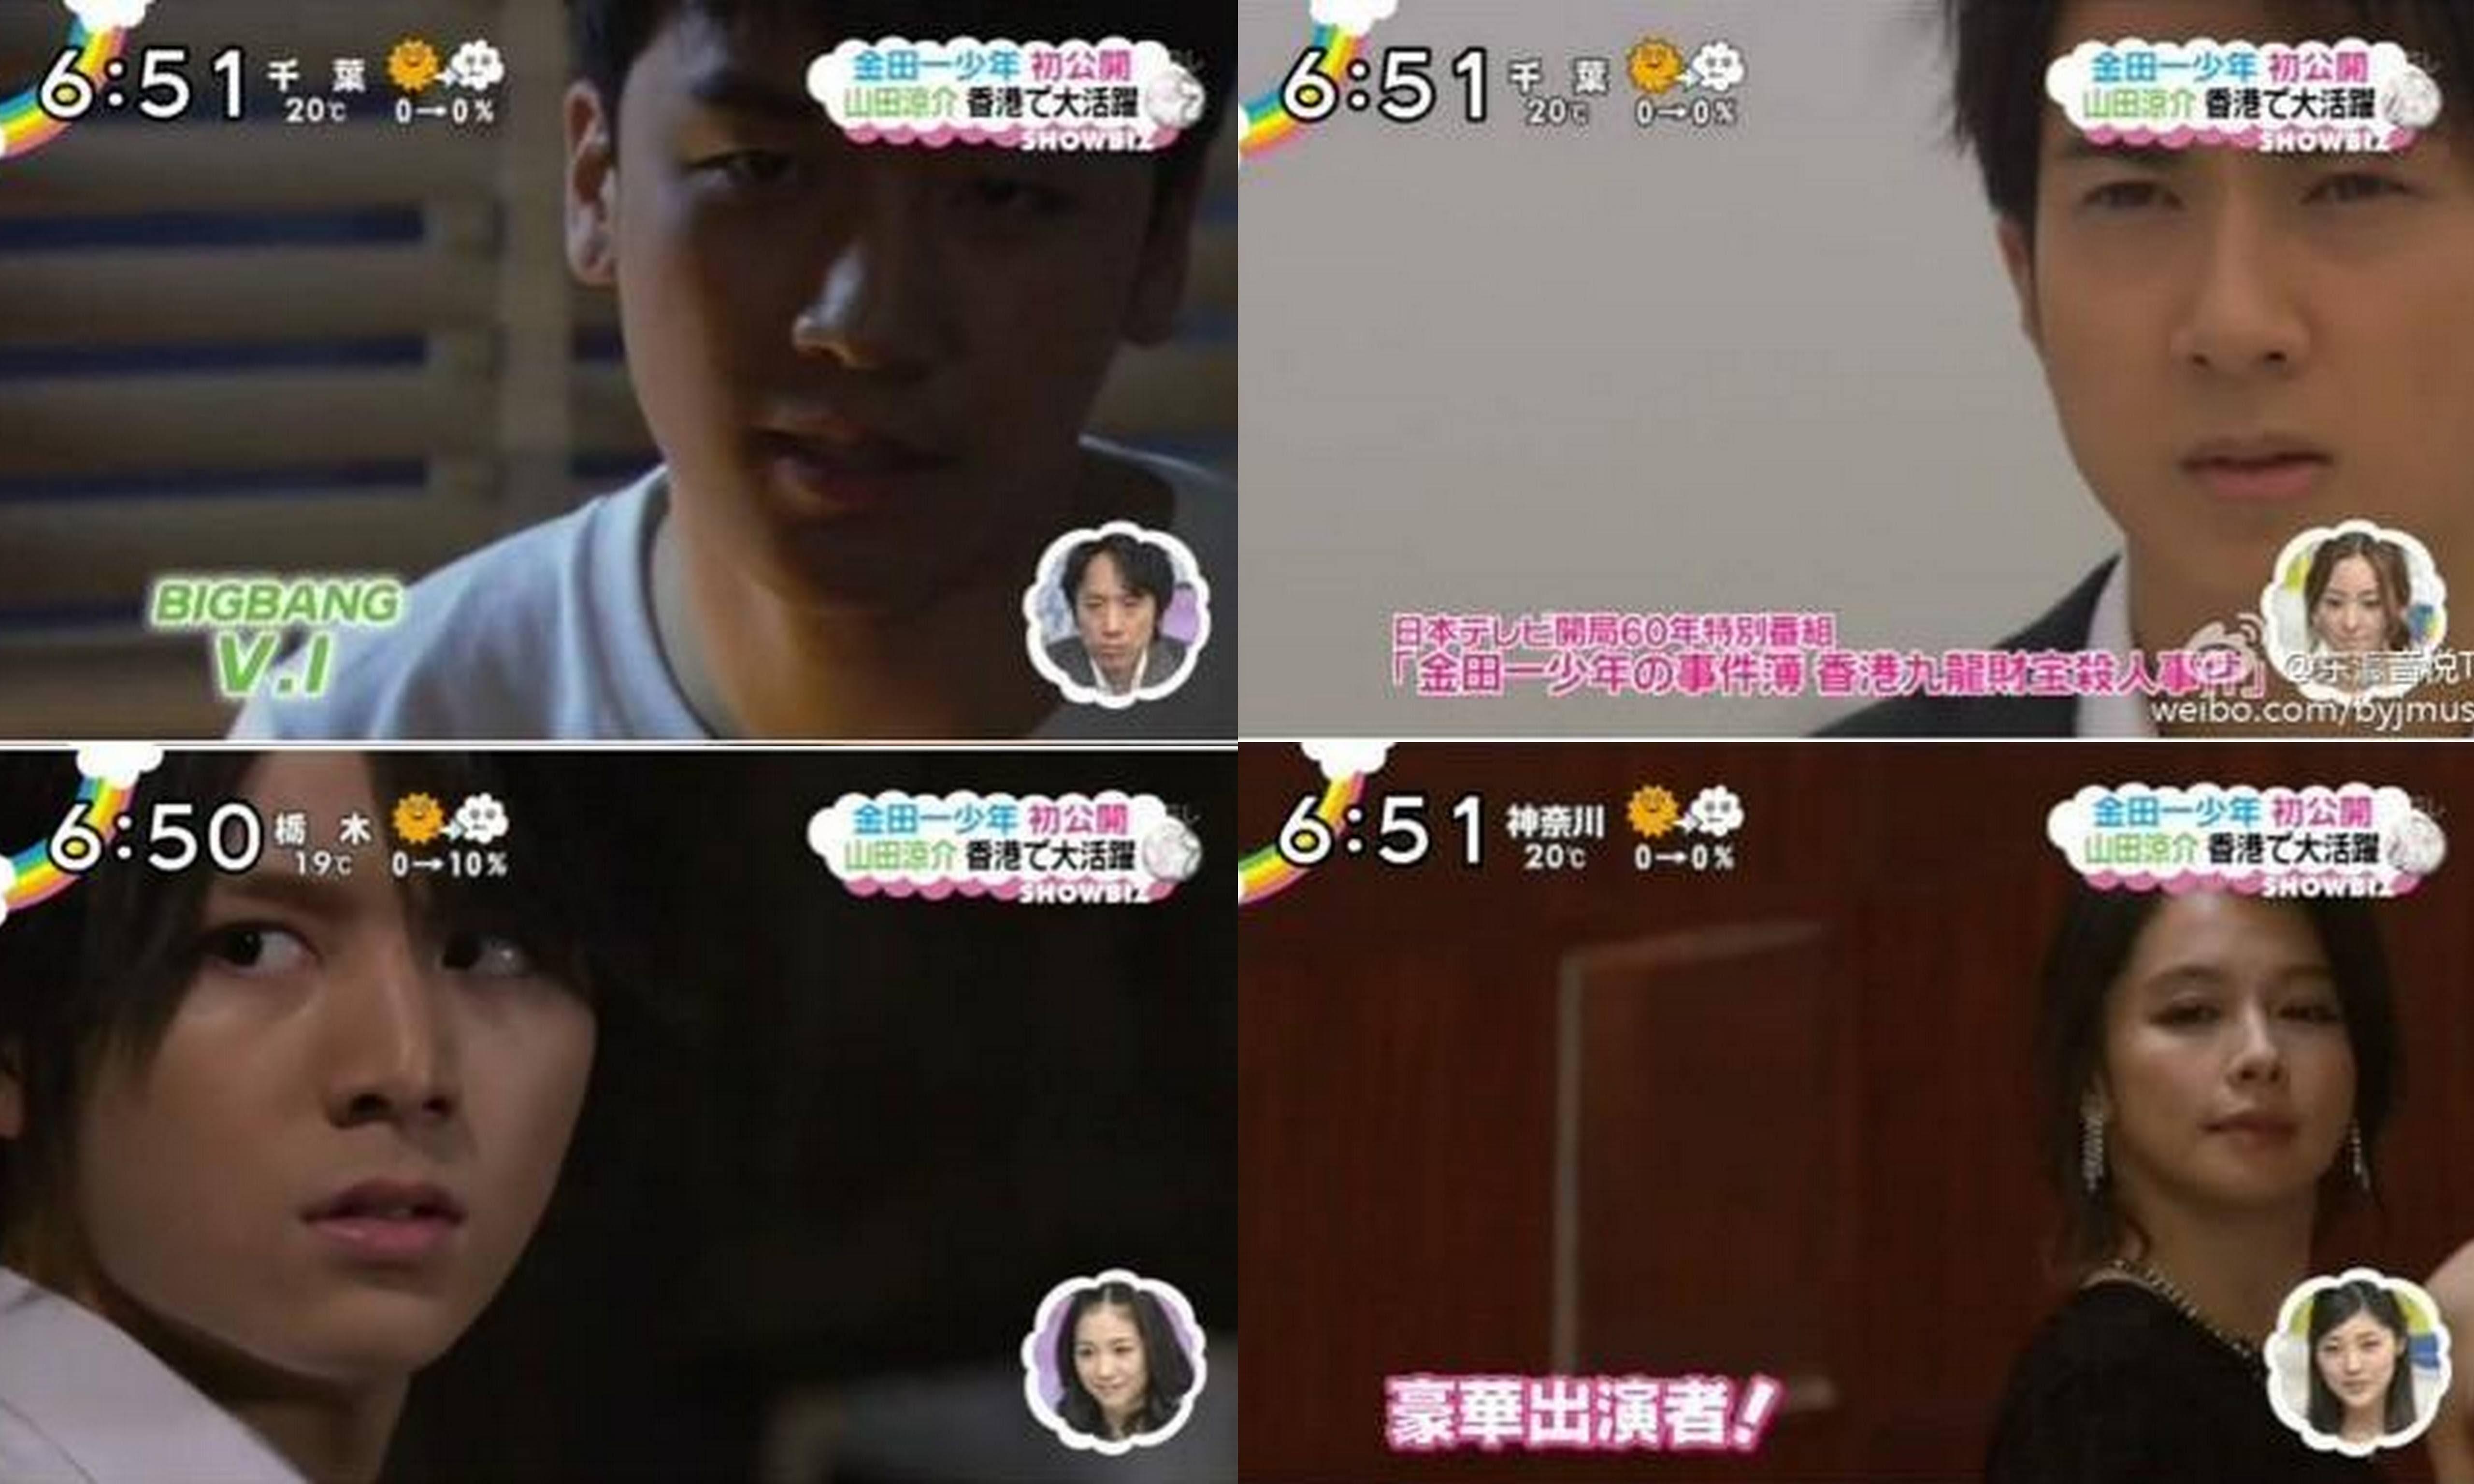 BIGBANGWORLD: [VIDEO] Preview of Seungri's Drama ... Yamada Ryosuke And Seungri